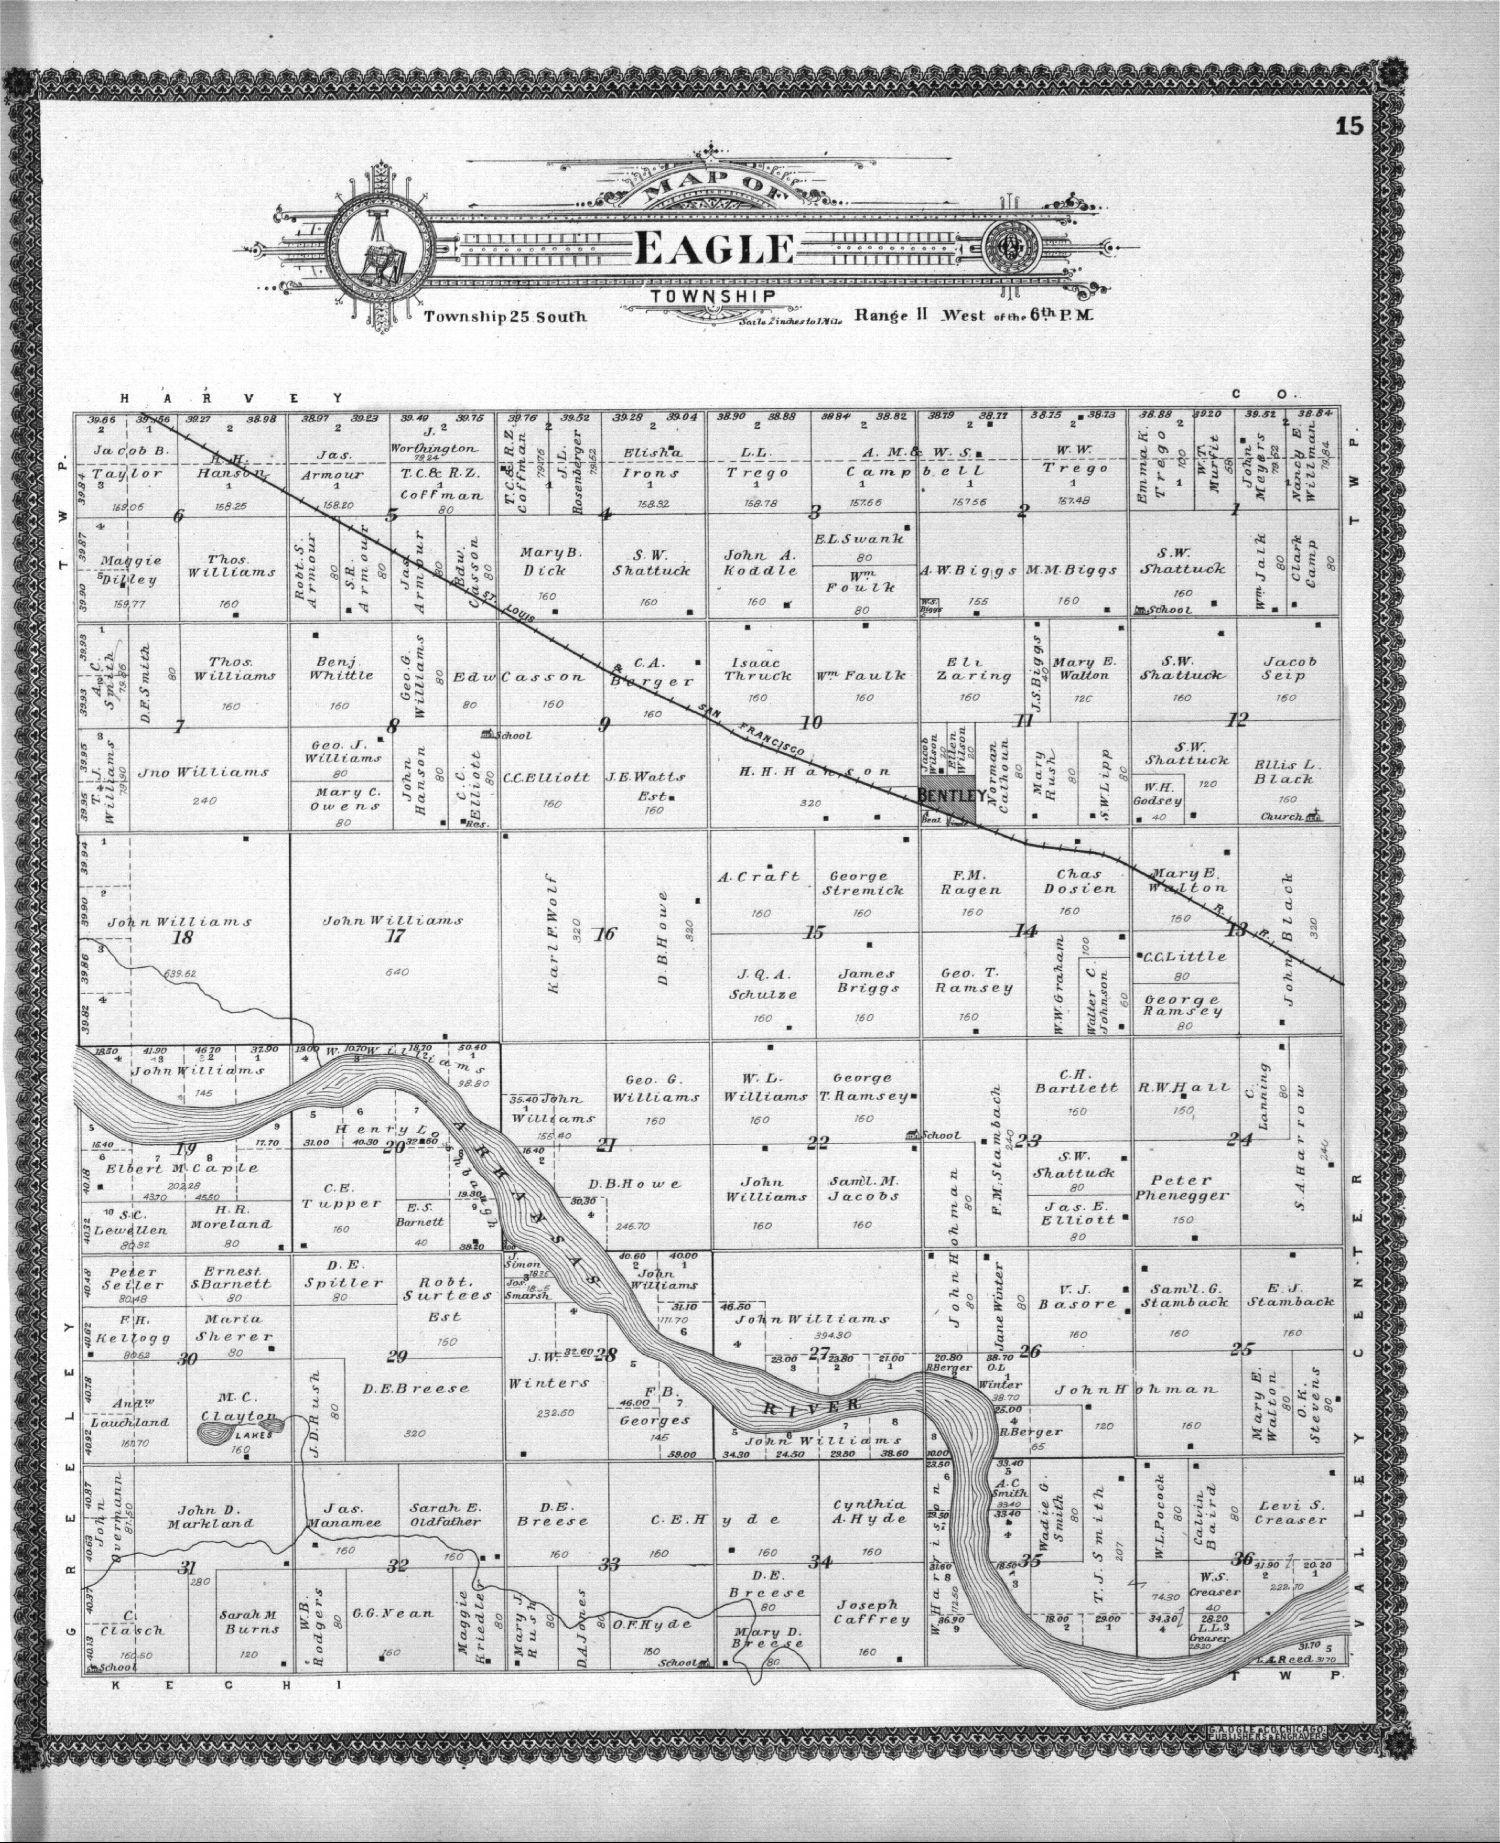 Standard atlas of Sedgwick County, Kansas - 15